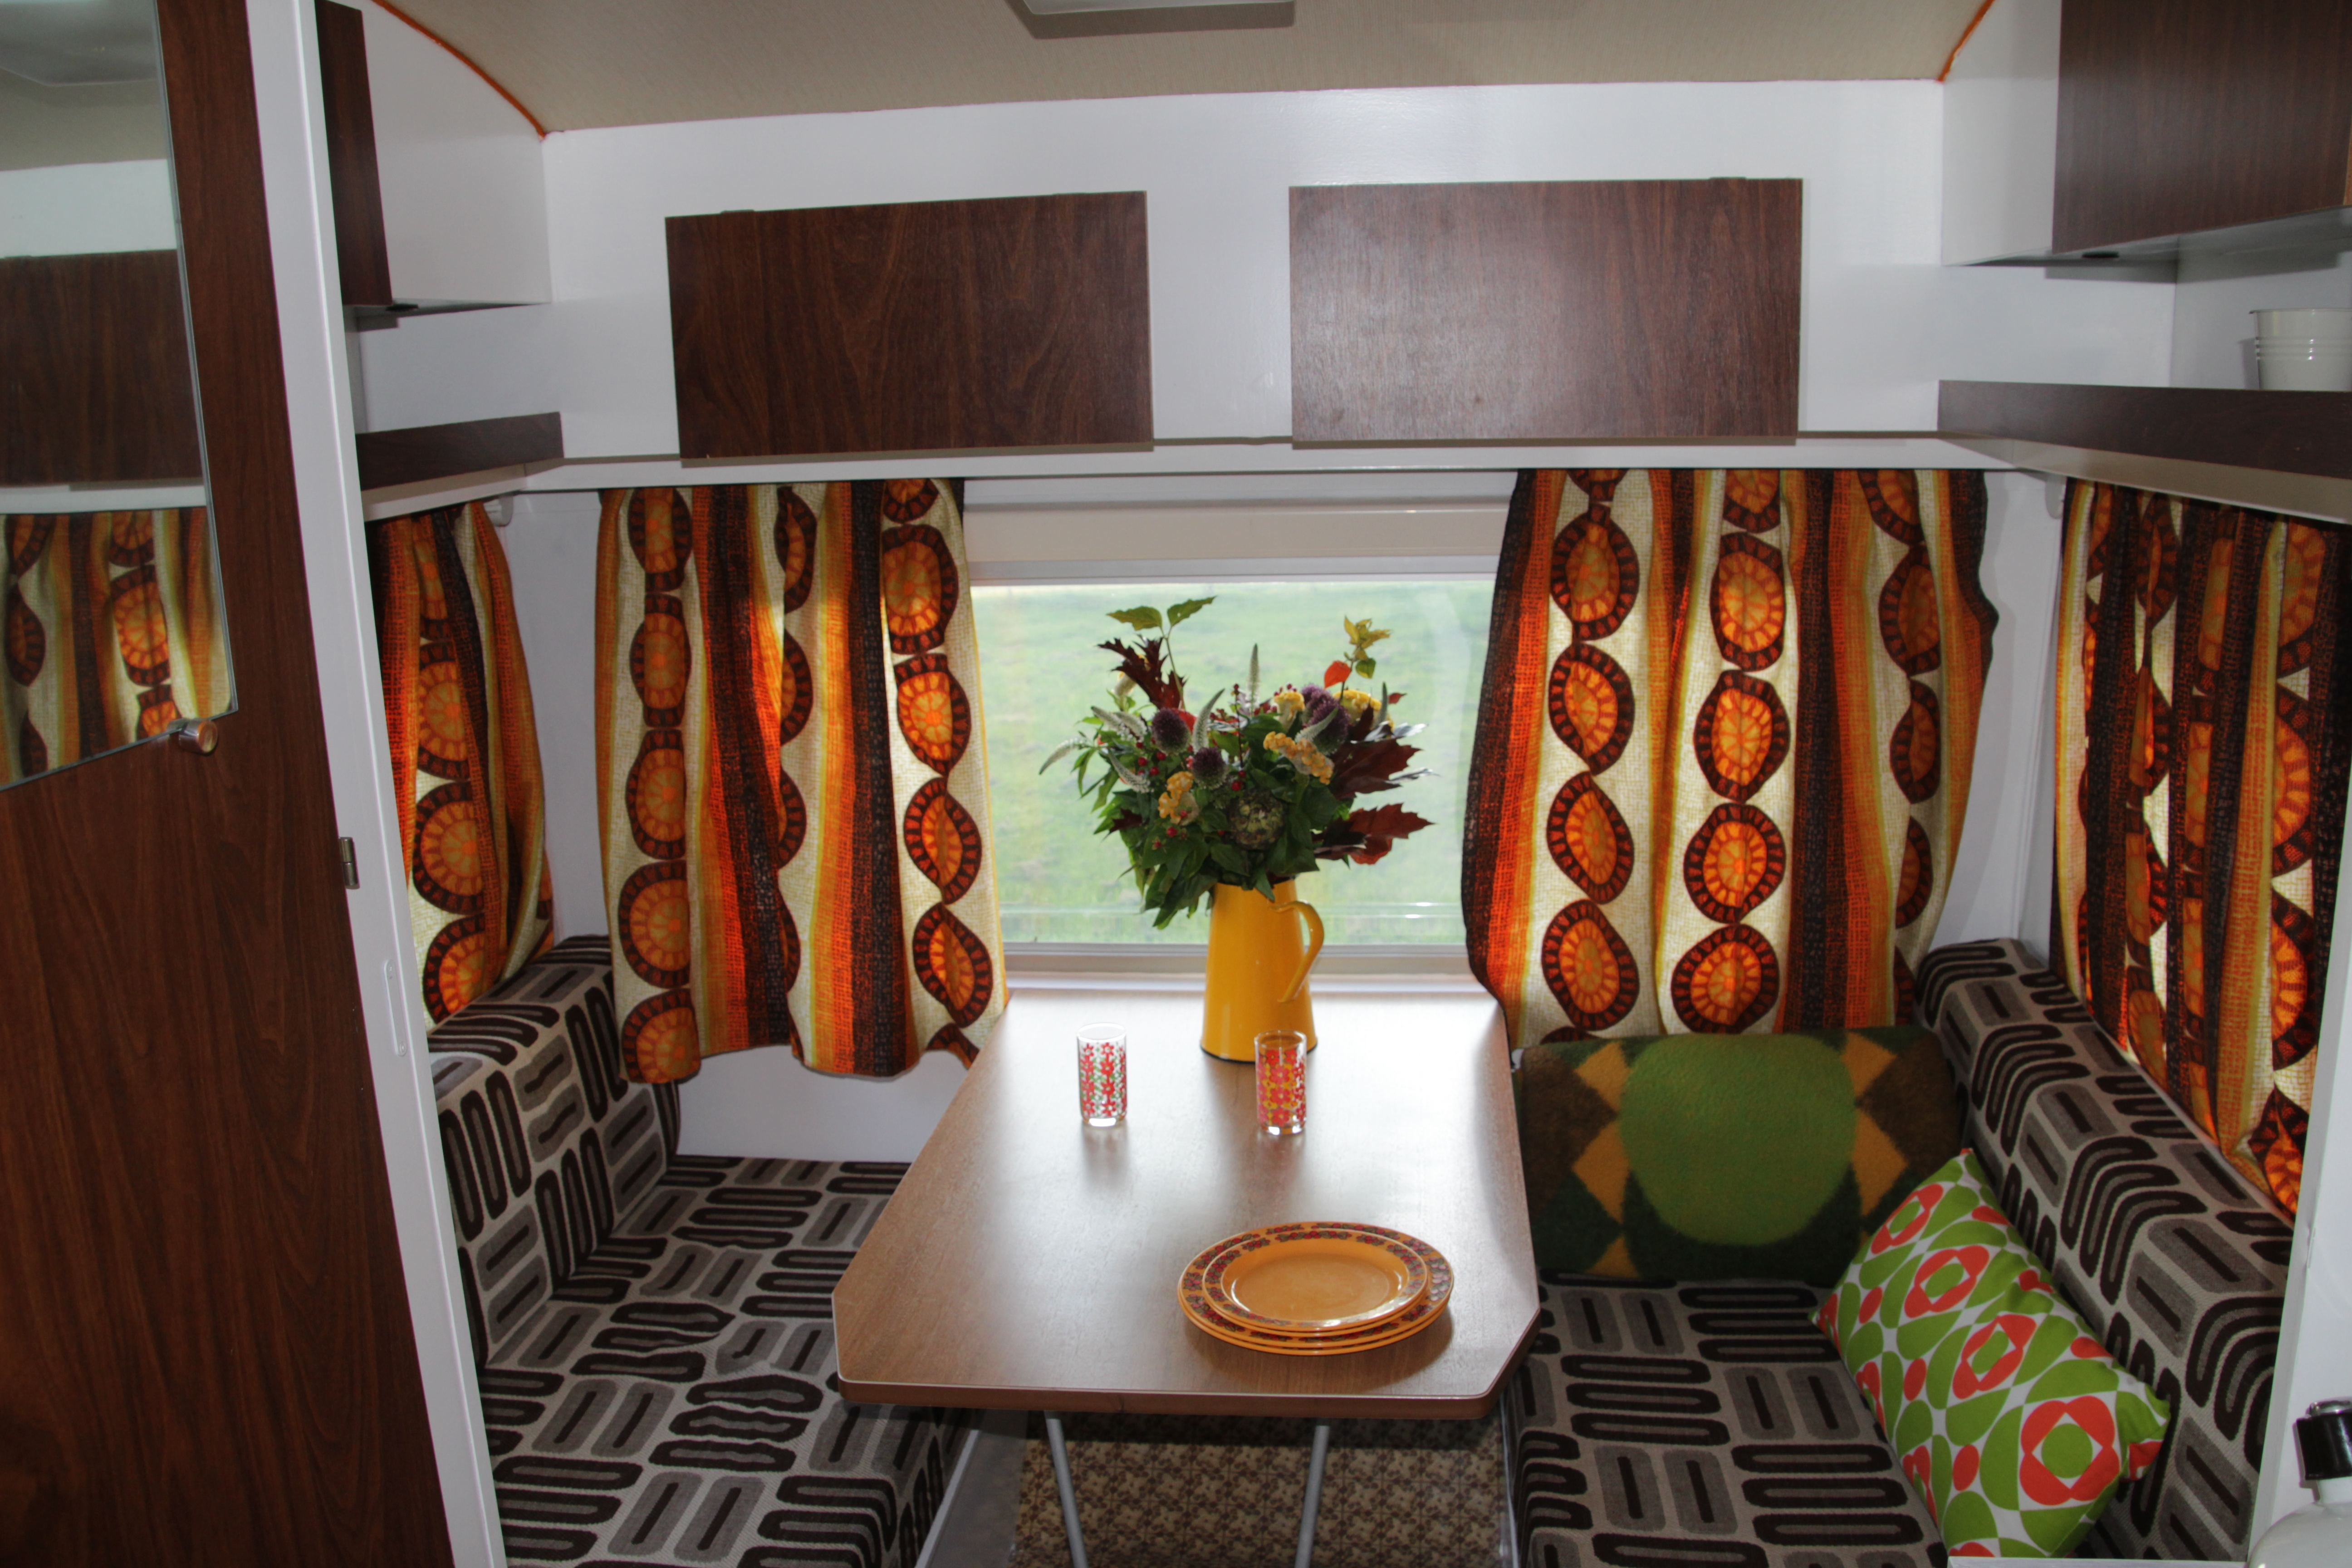 My Retro Caravan – Caravan verhuur